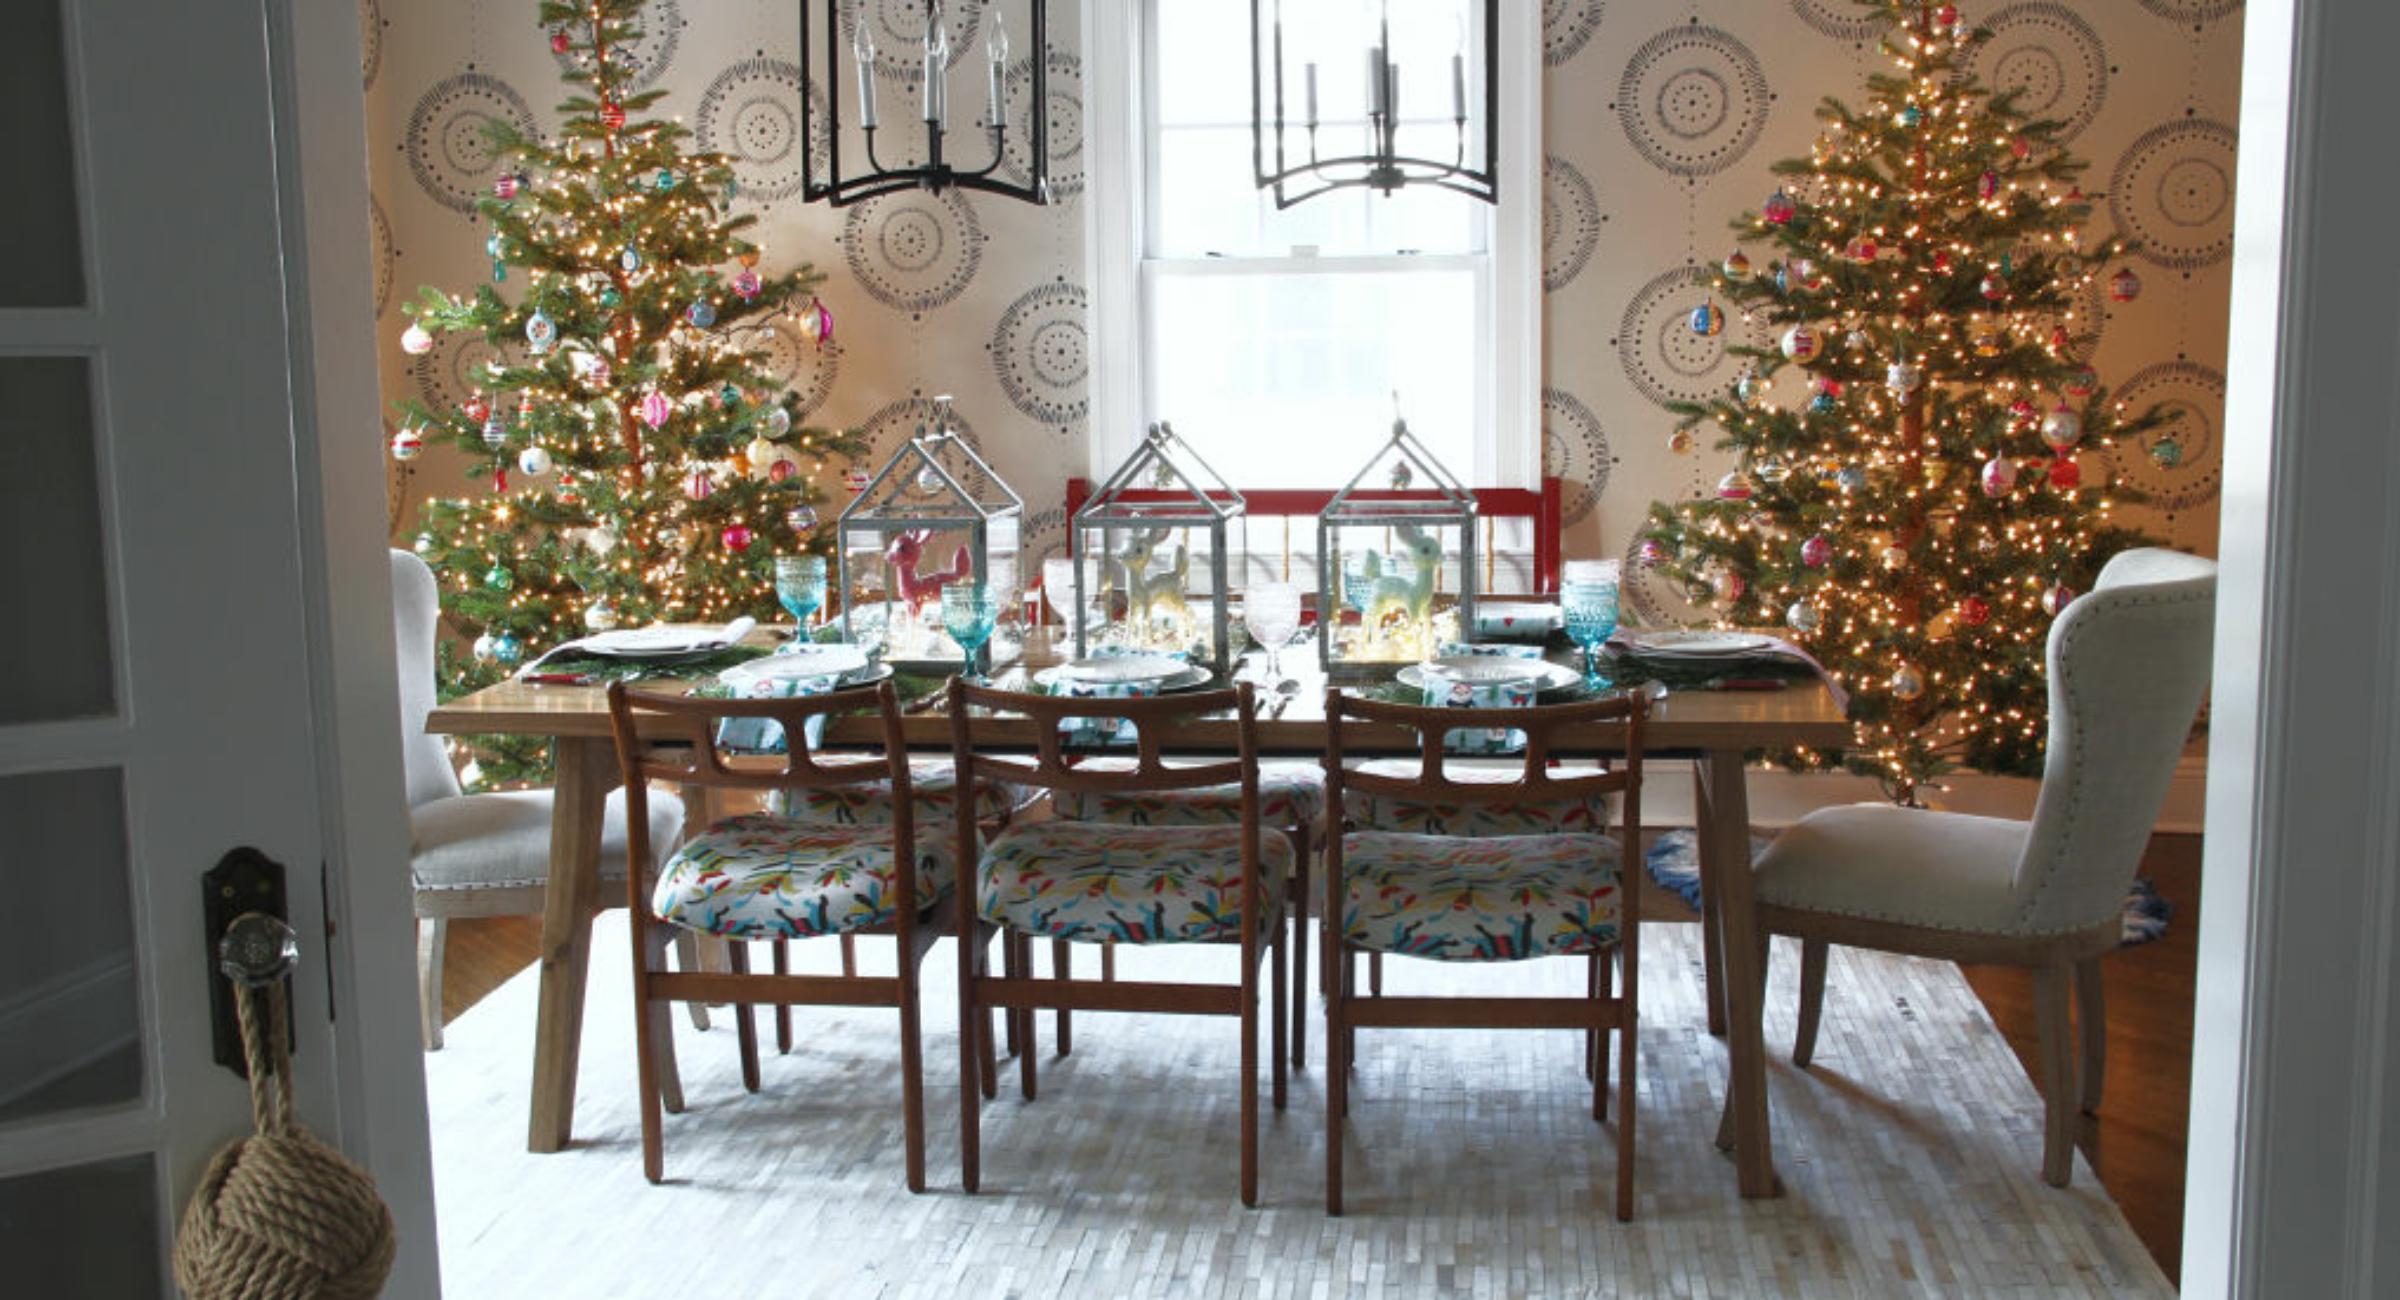 pair-christmas-trees-dining-room-vintage-shiny-brites-pastel-table-setting (1)